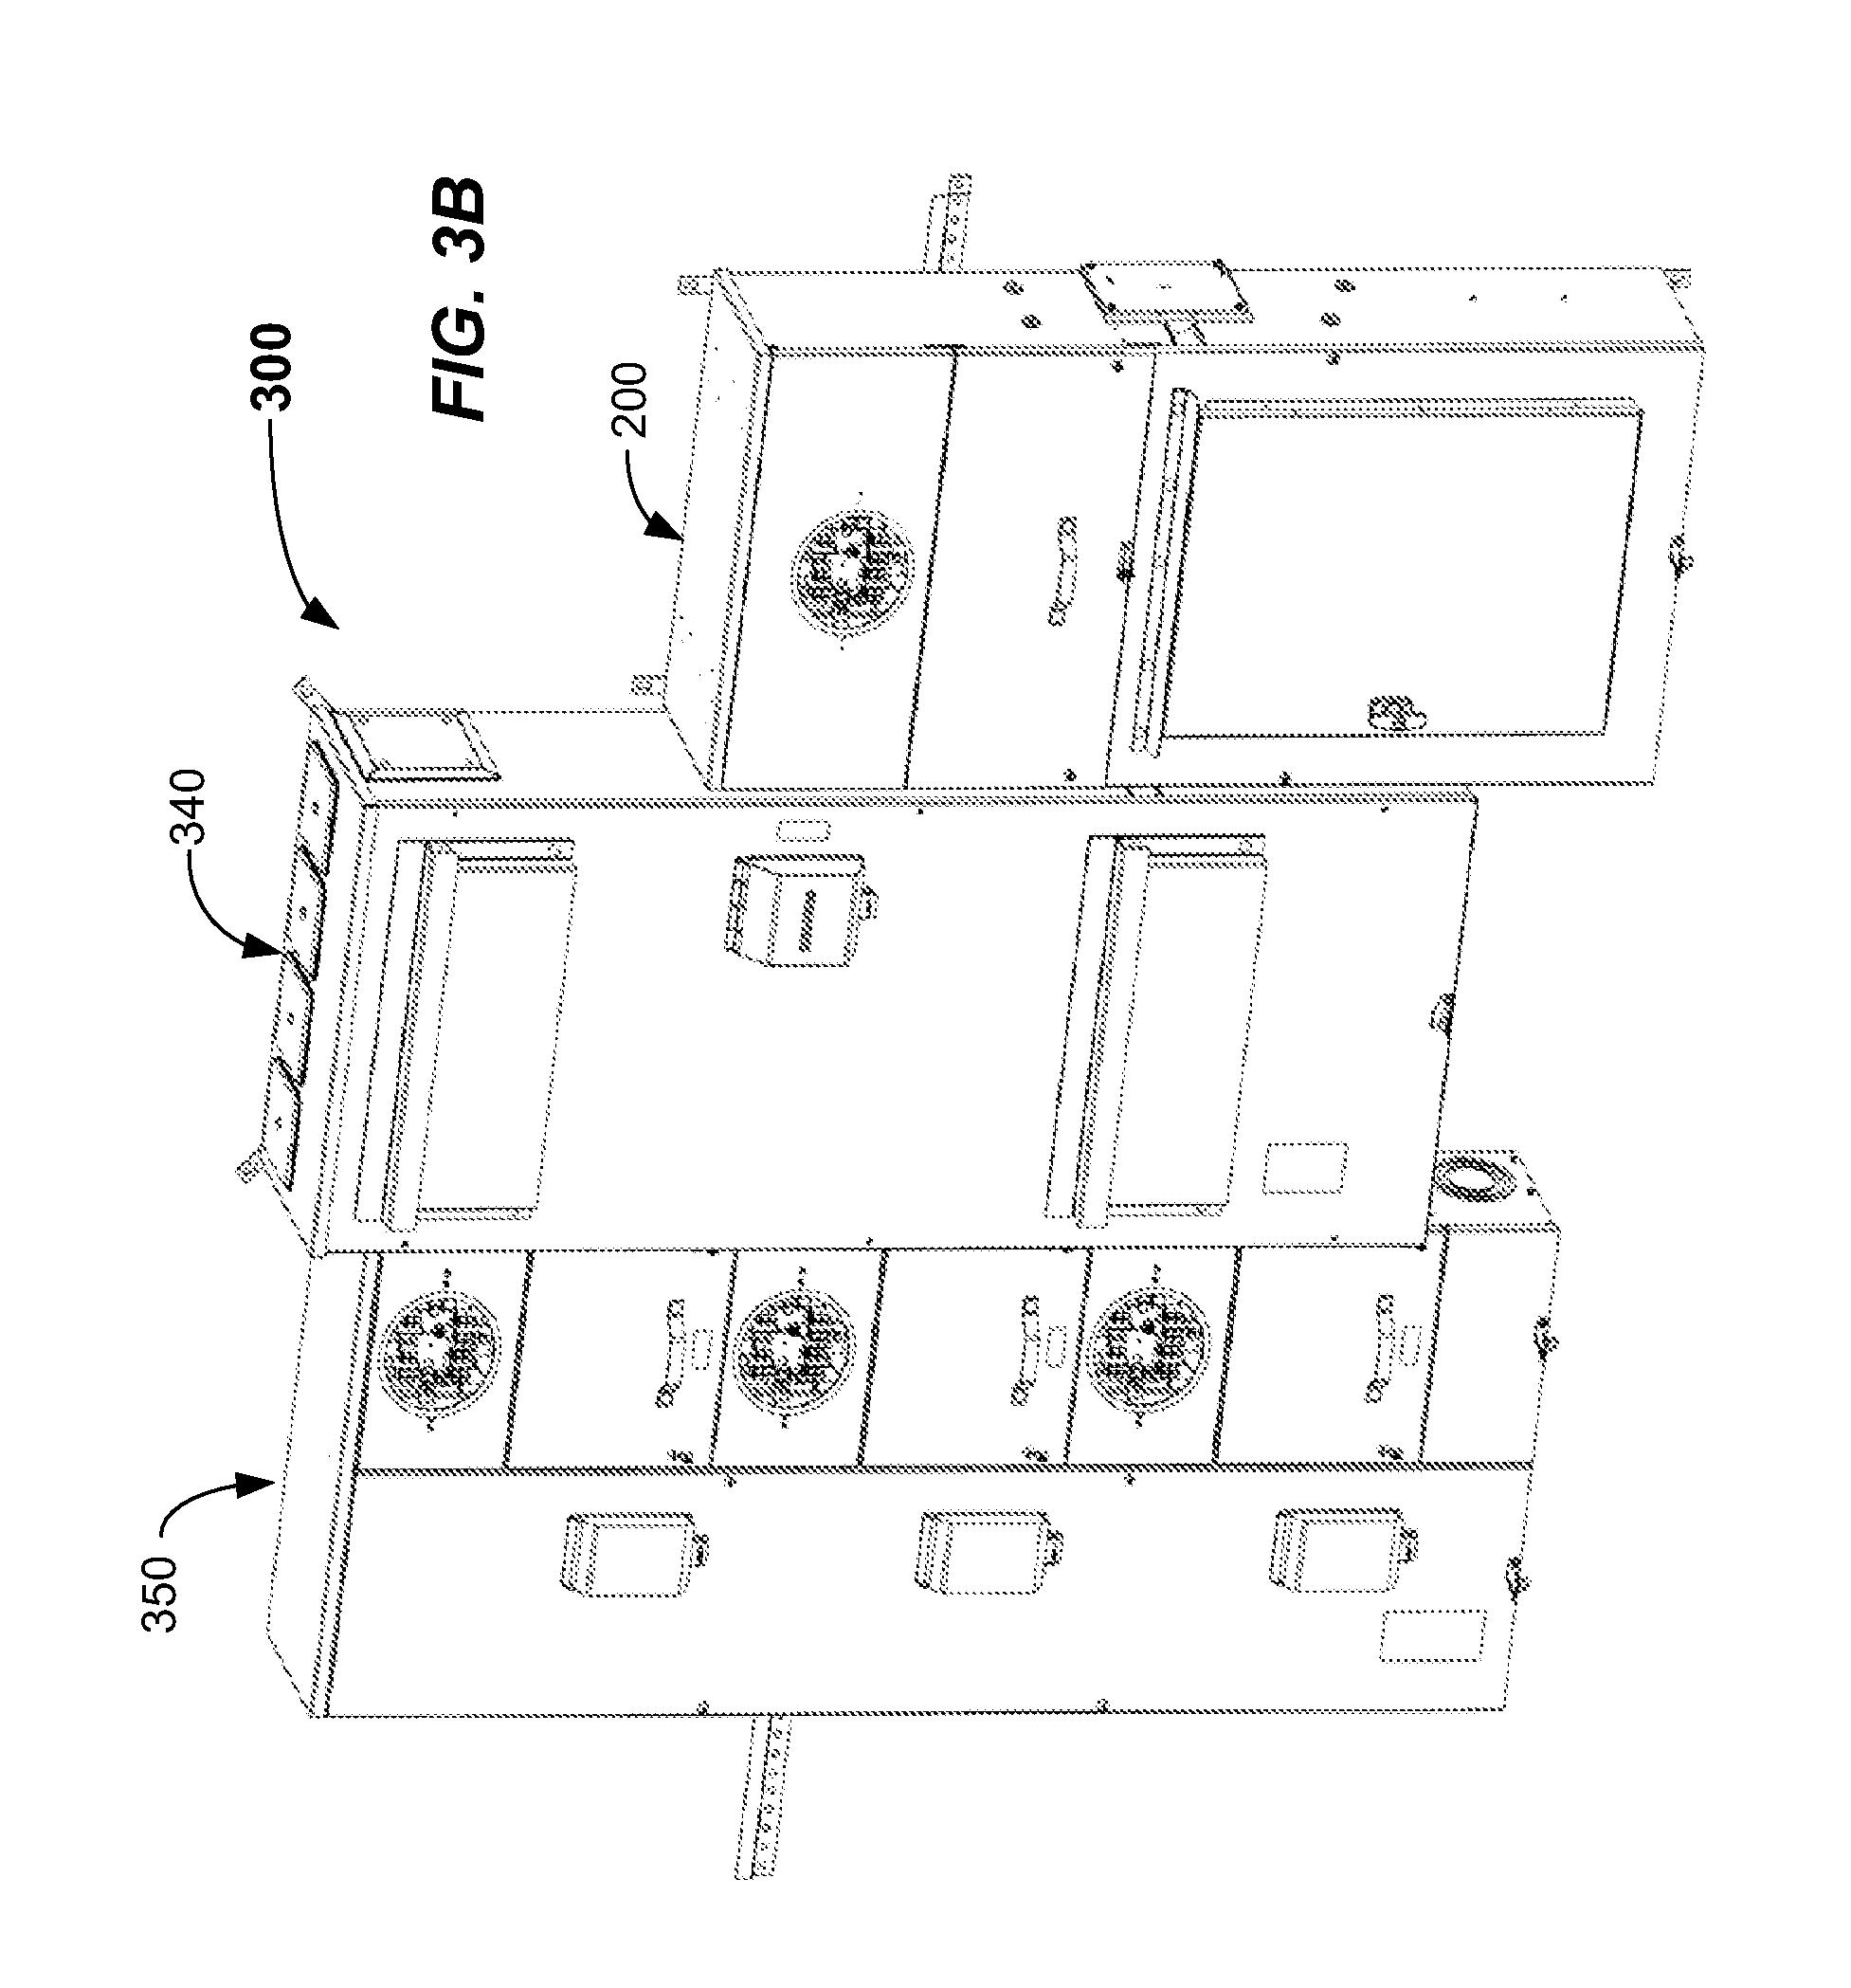 kohler command 18 ignition switch wiring diagram